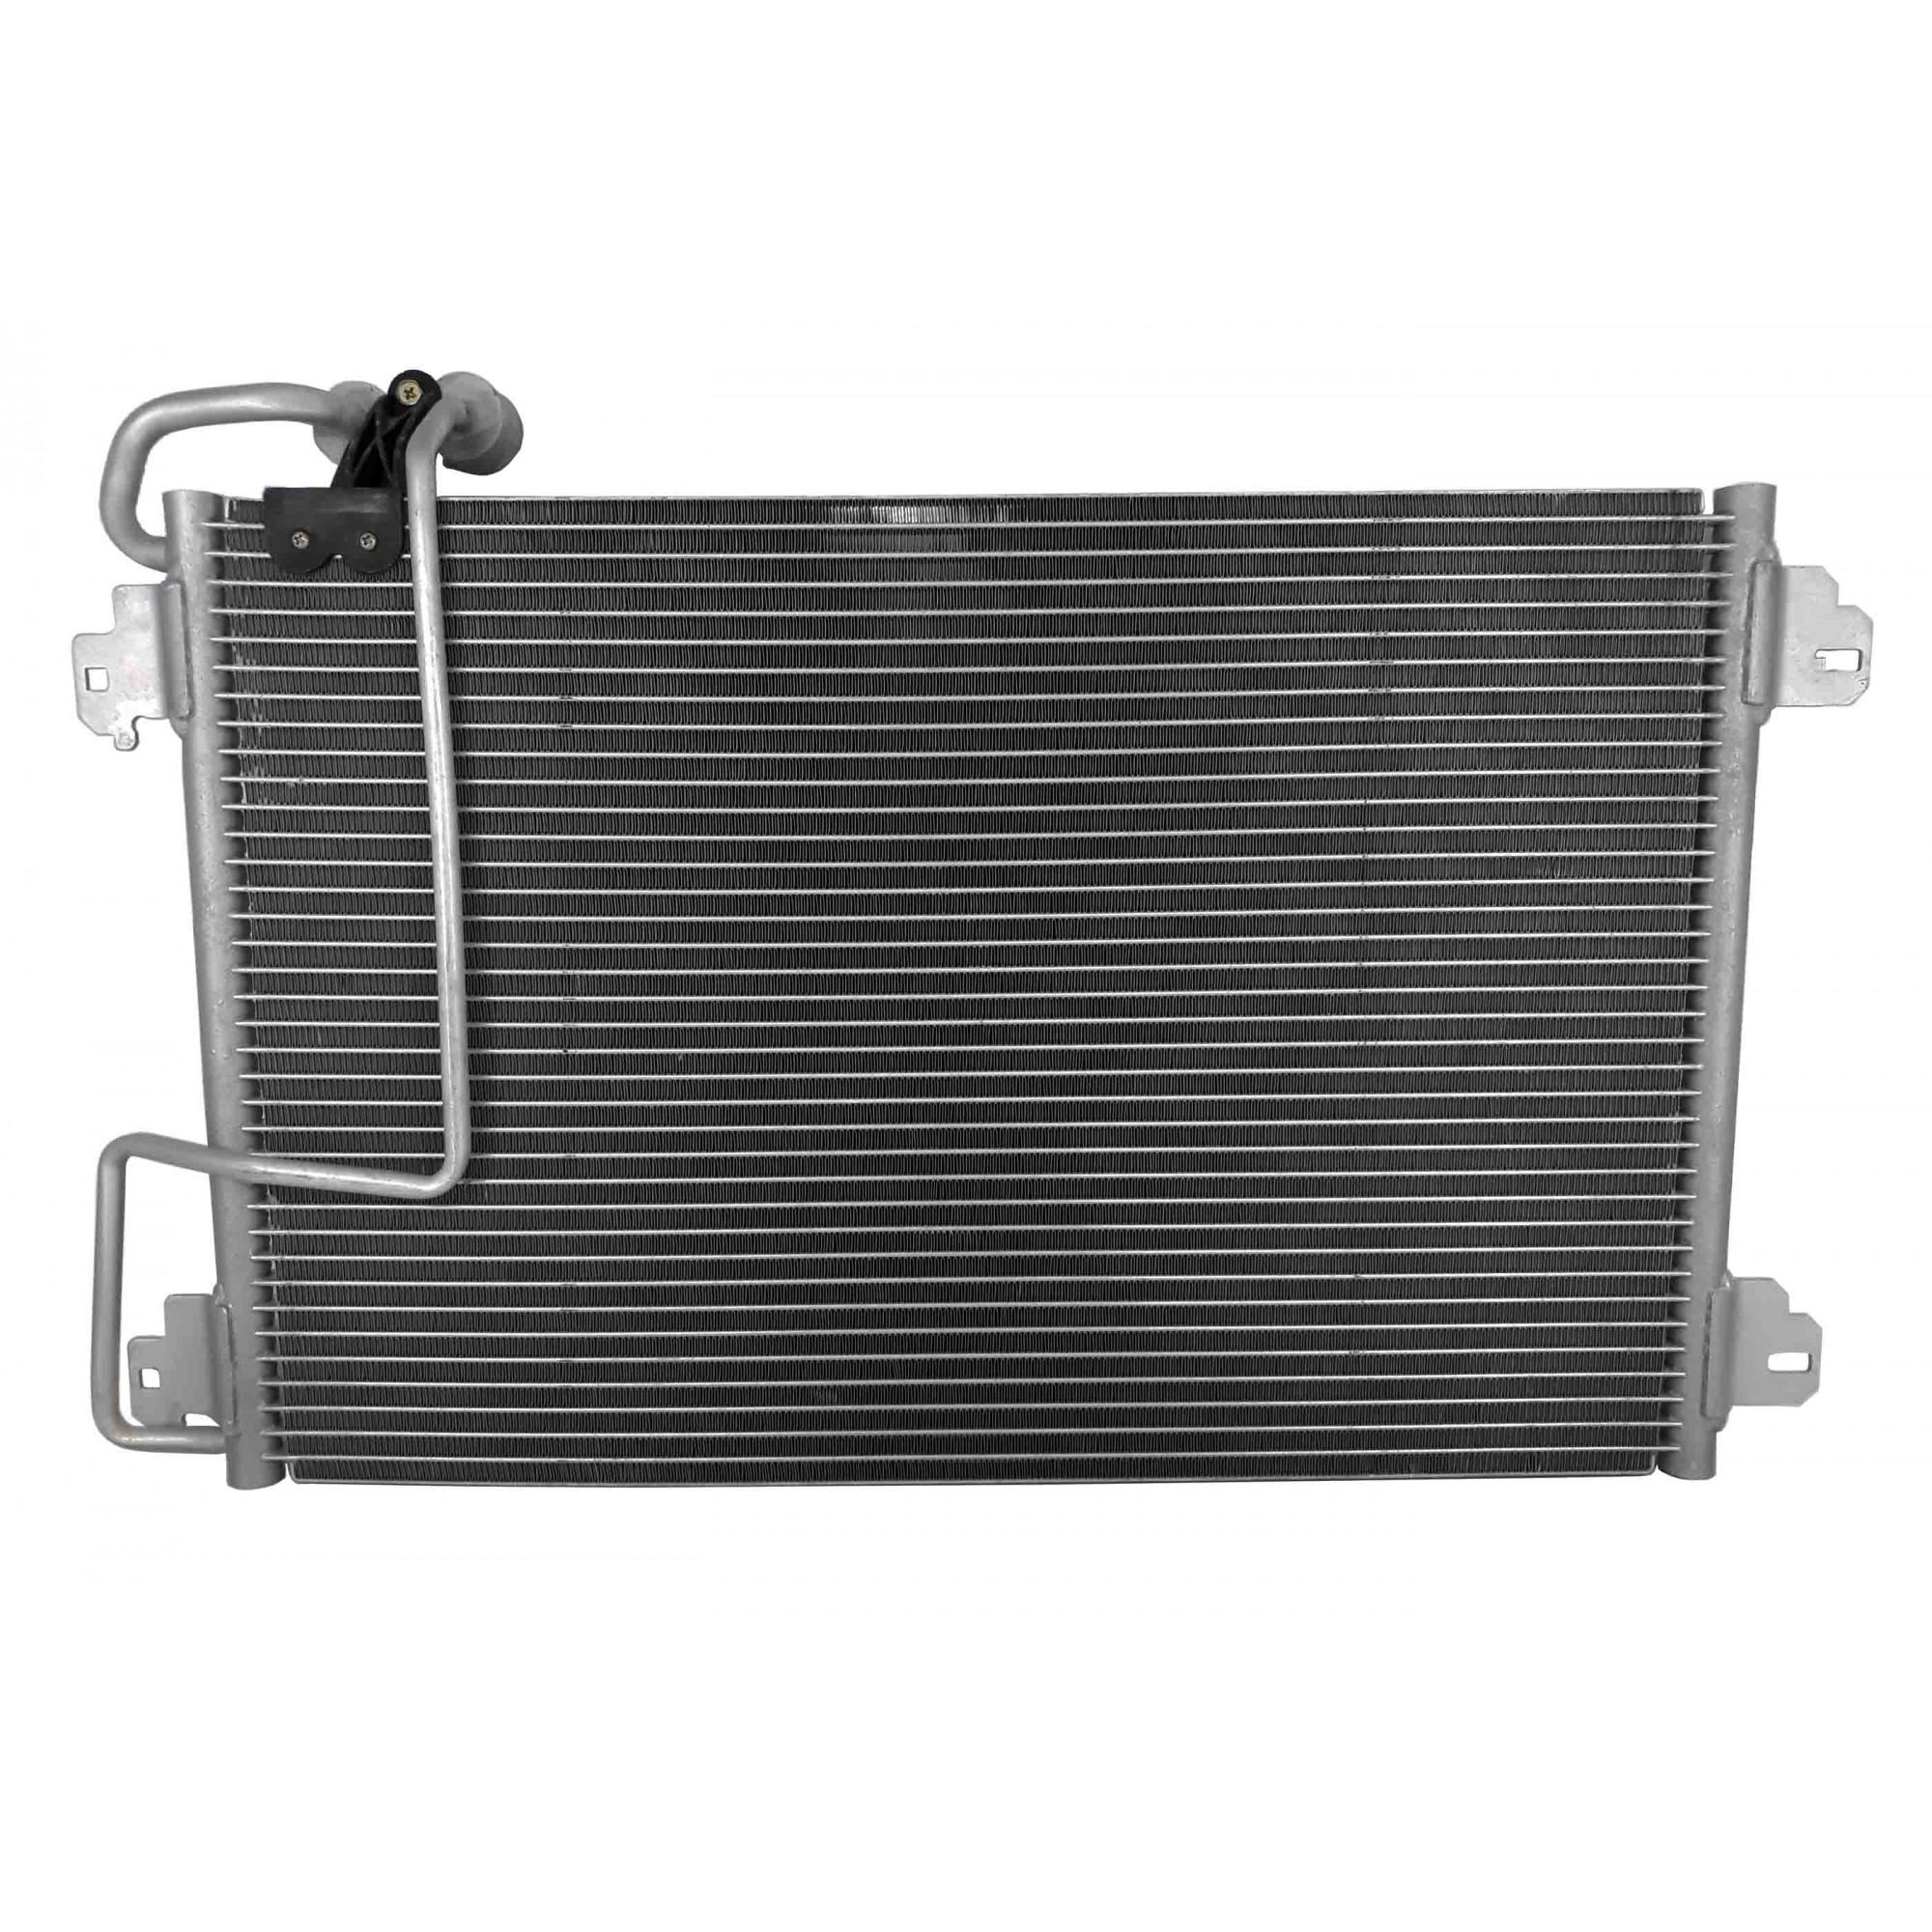 Condensador Renault Megane / Scenic 99 -09